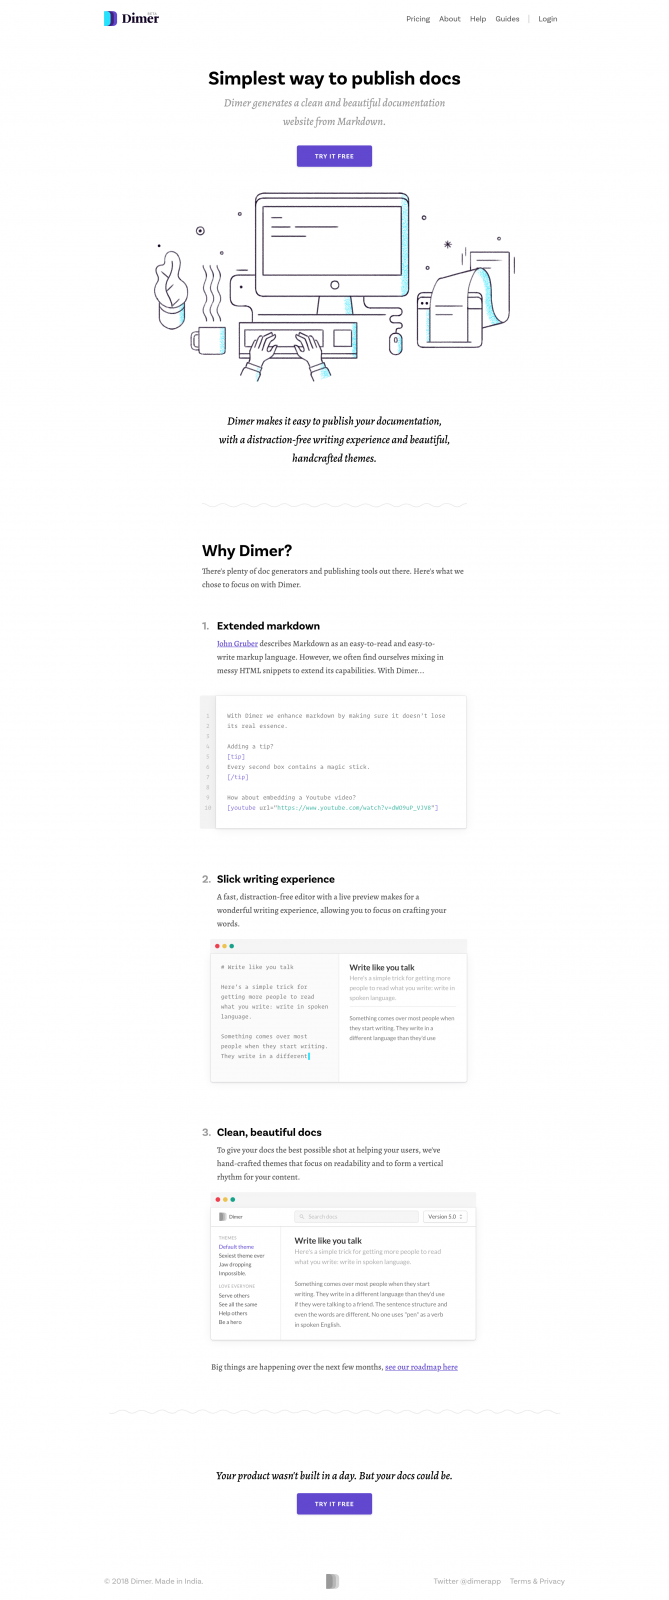 Dimer - Simplest way to publish docs